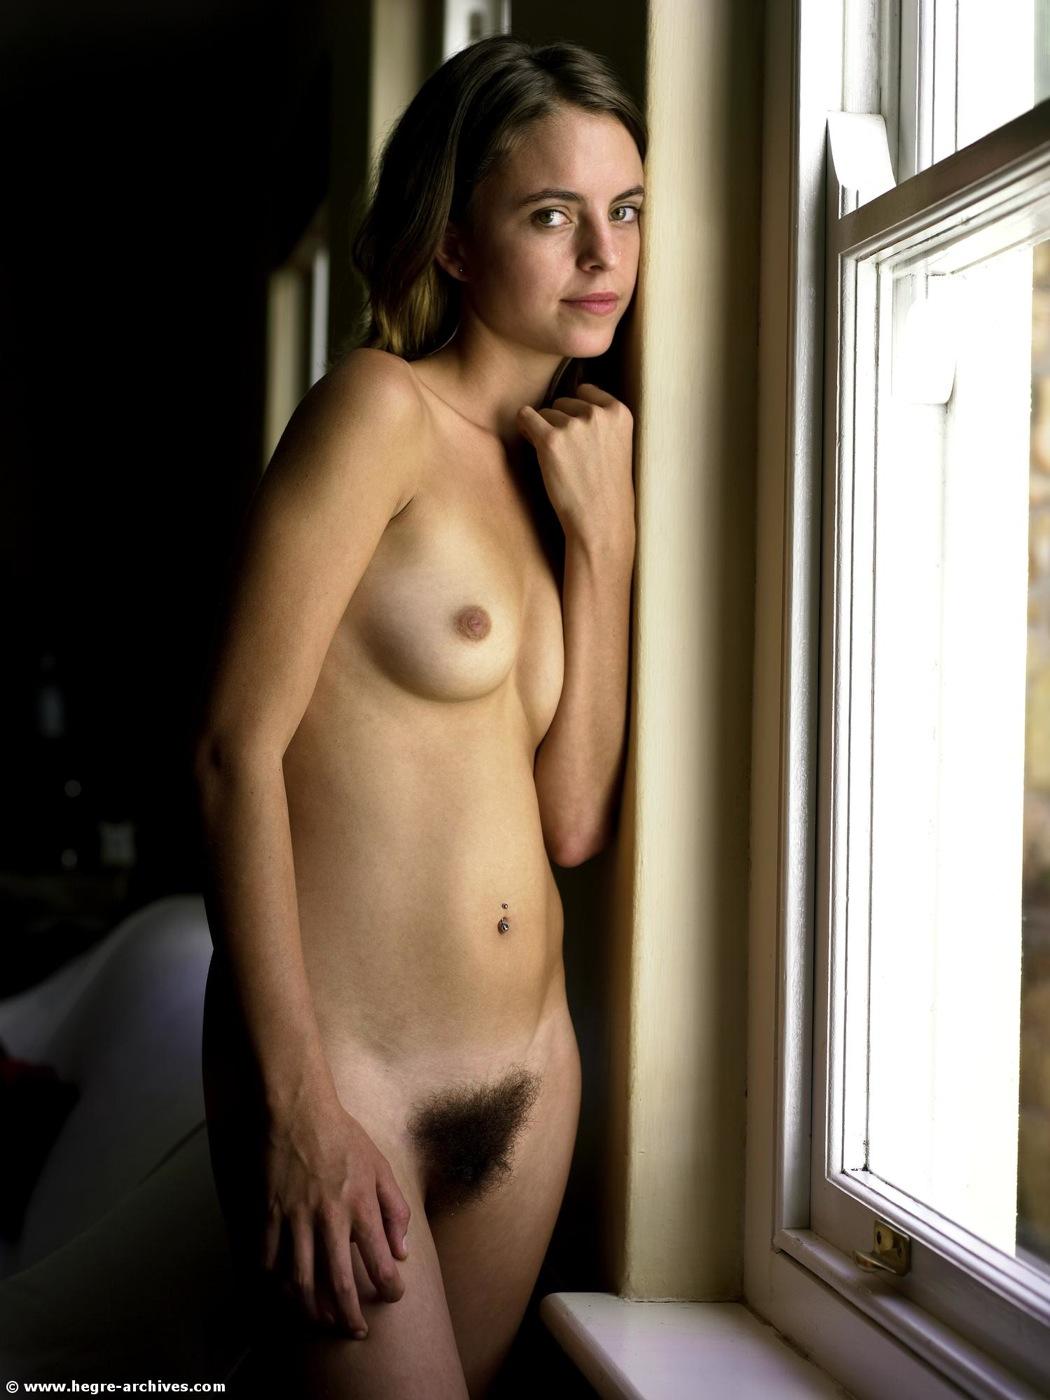 Tubo de chica adolescente desnuda